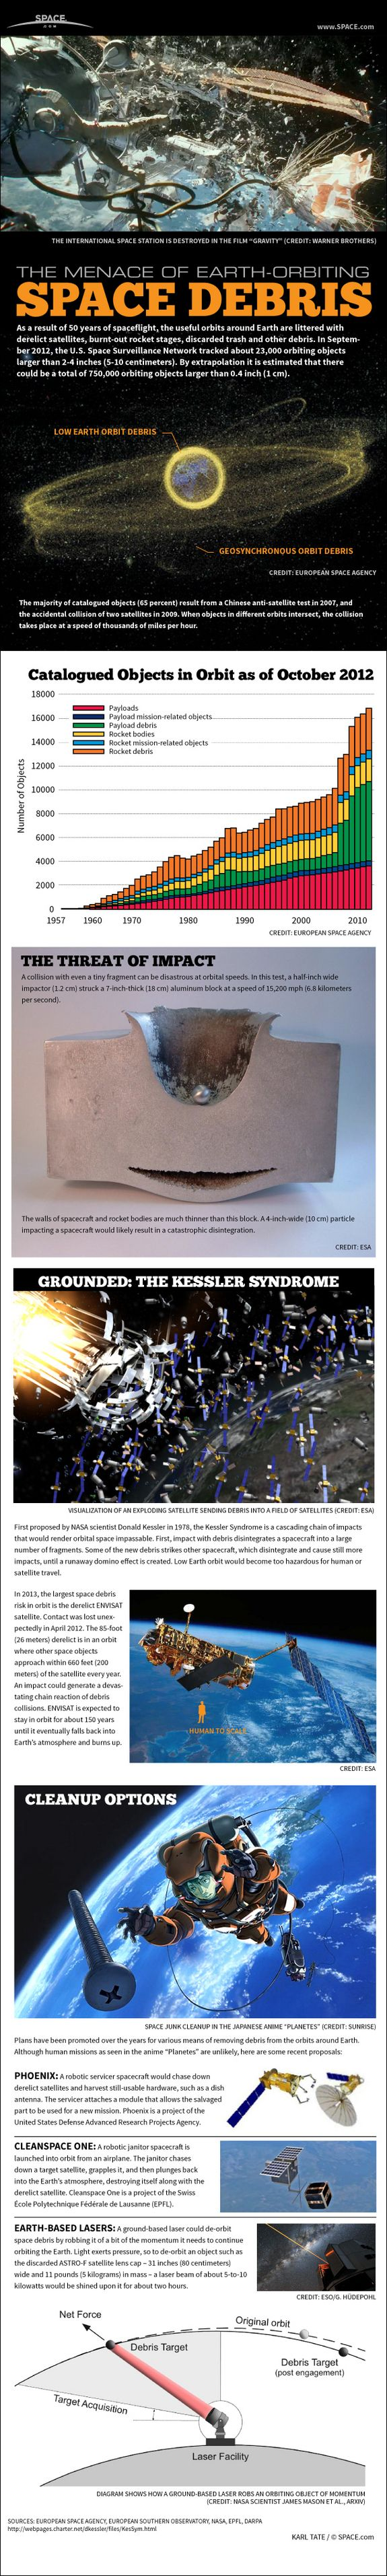 Space Junk Explained: How Orbital Debris Threatens Future of Spaceflight #Infographic